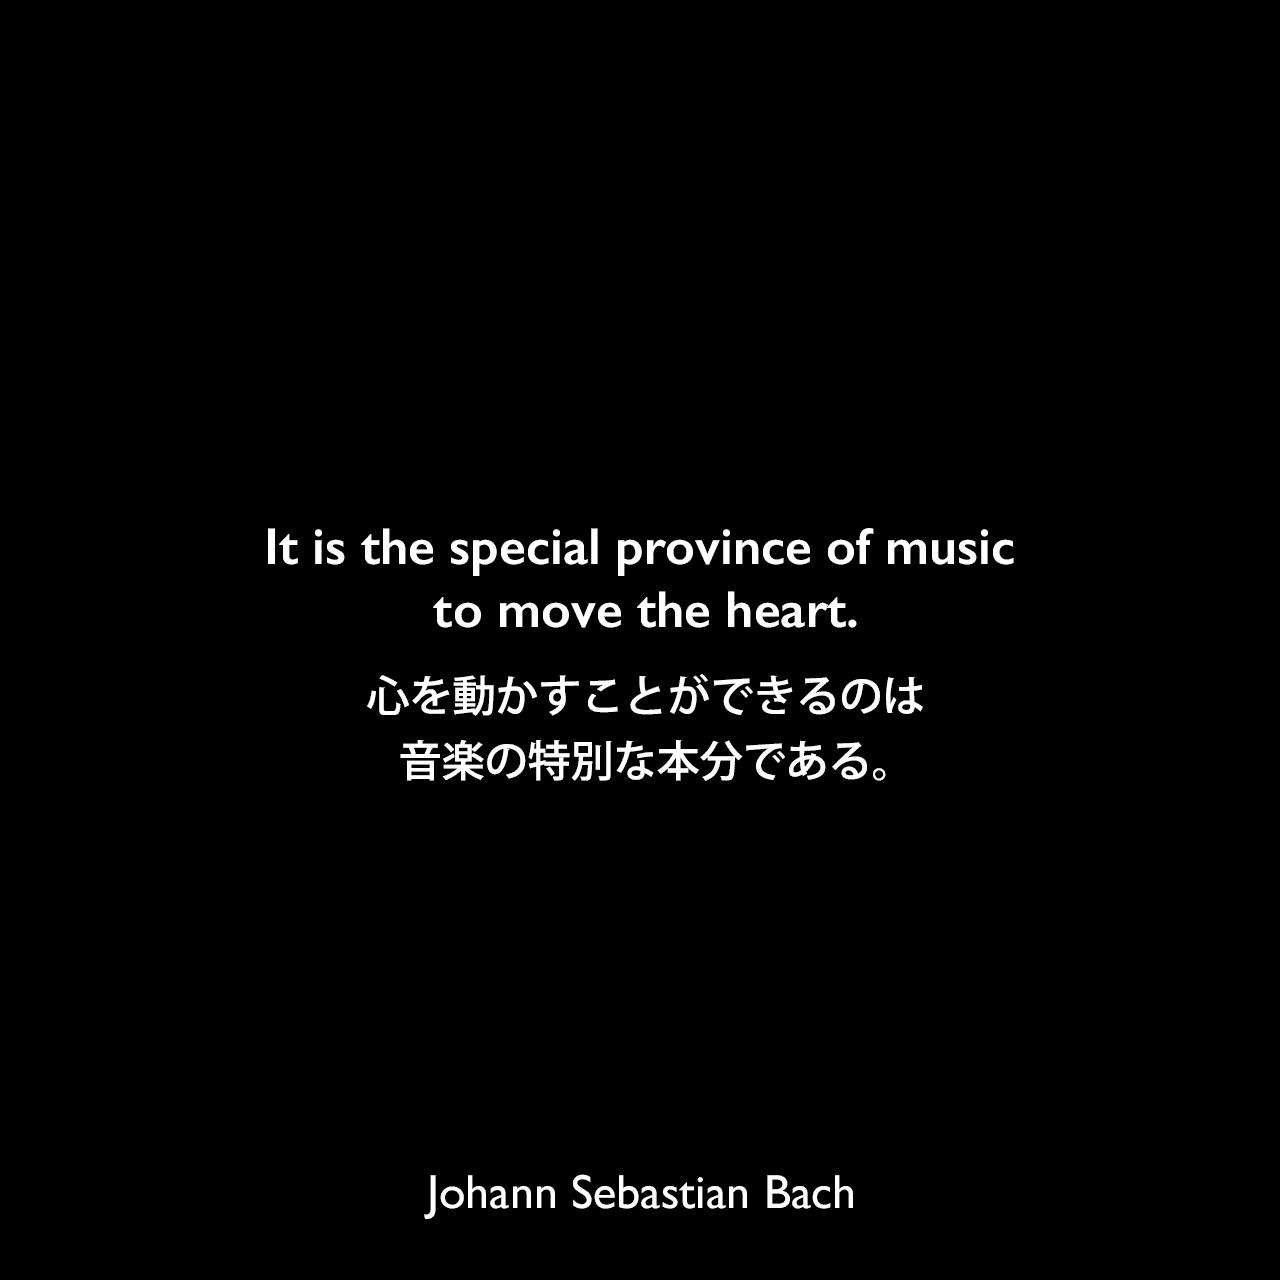 It is the special province of music to move the heart.心を動かすことができるのは、音楽の特別な本分である。Johann Sebastian Bach